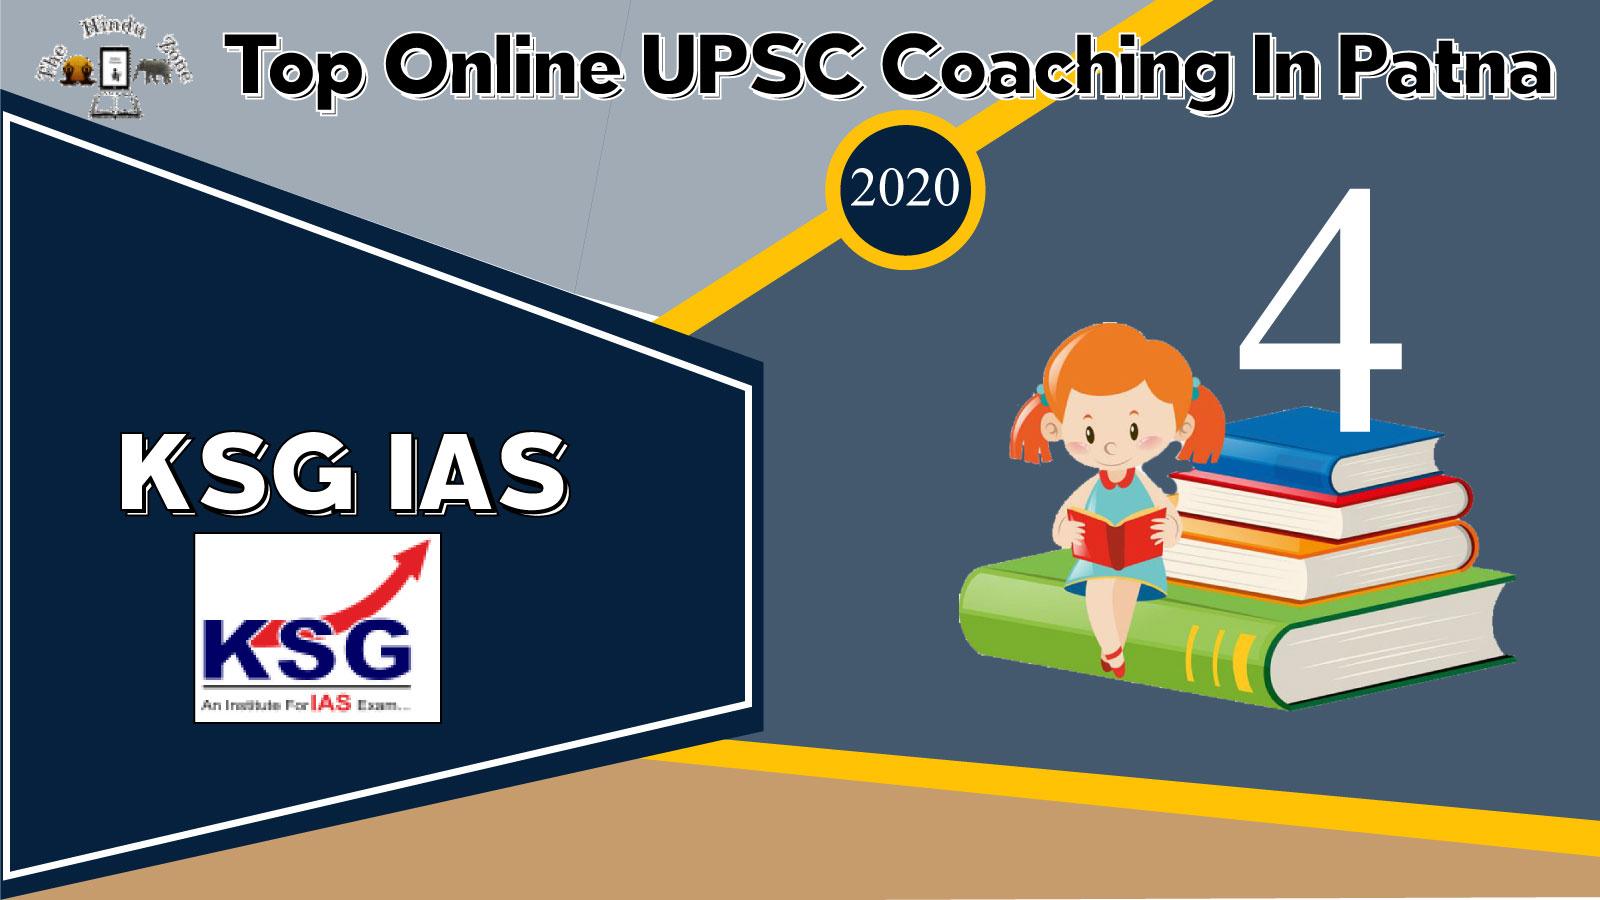 KSG IAS Online Coaching In Patna